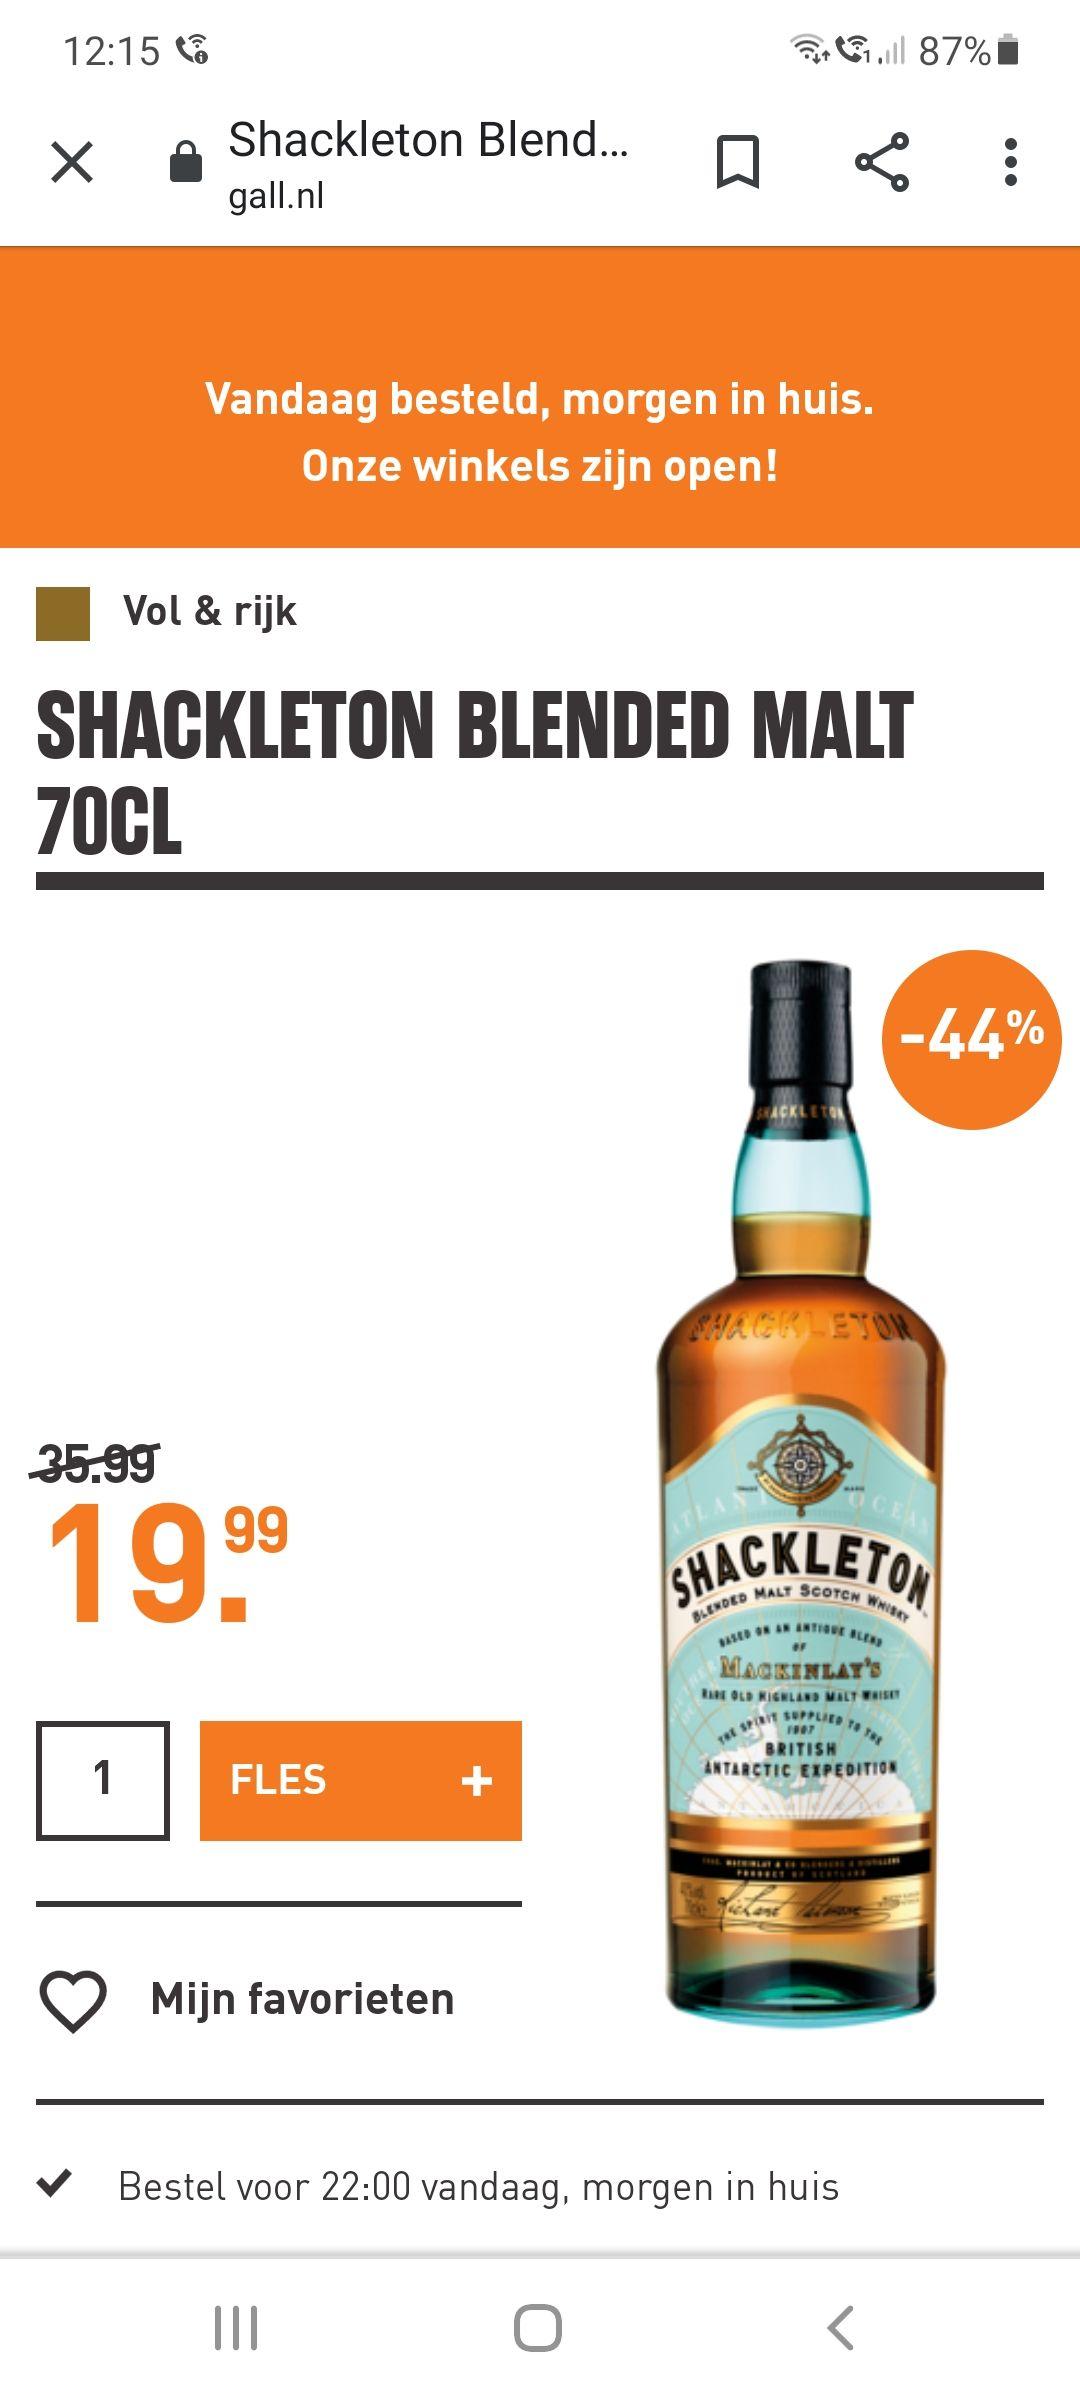 Mackinlay's Shackleton Blended Malt whisky @ Gall & Gall